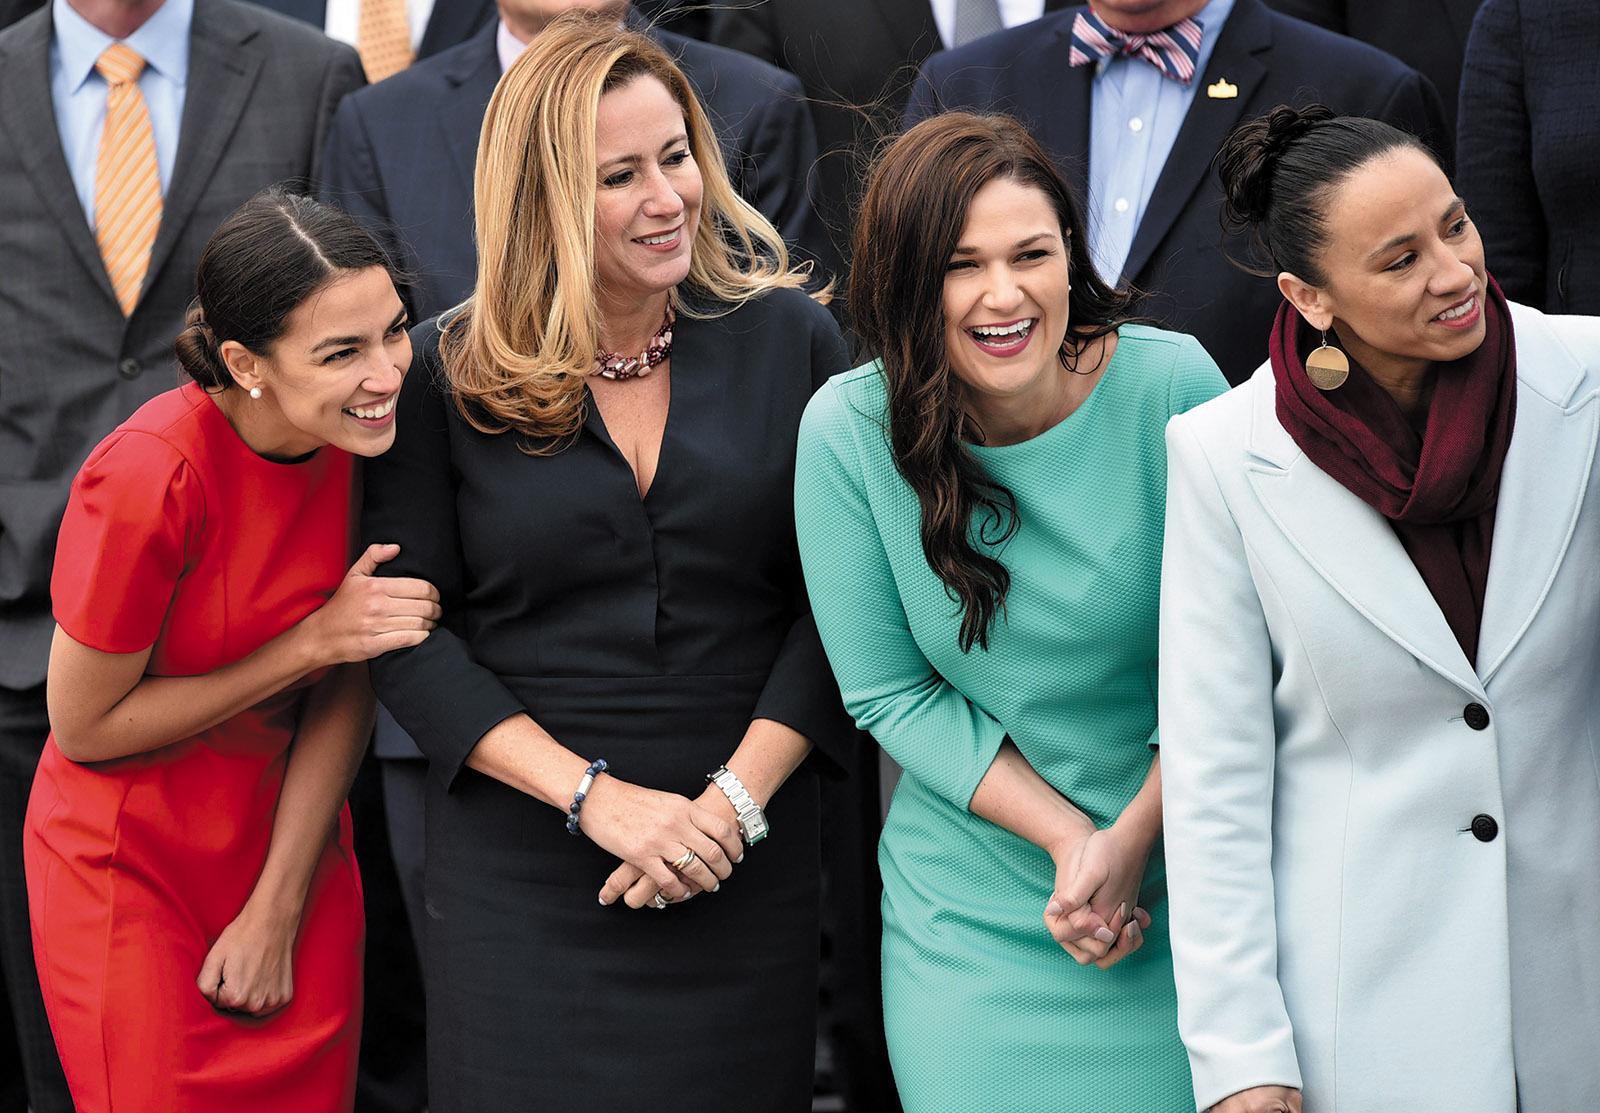 Newly elected Democratic congresswomen Alexandria Ocasio-Cortez (New York), Debbie Mucarsel-Powell (Florida), Abby Finkenauer (Iowa), and Sharice Davids (Kansas) at the US Capitol, Washington, D.C., November 2018